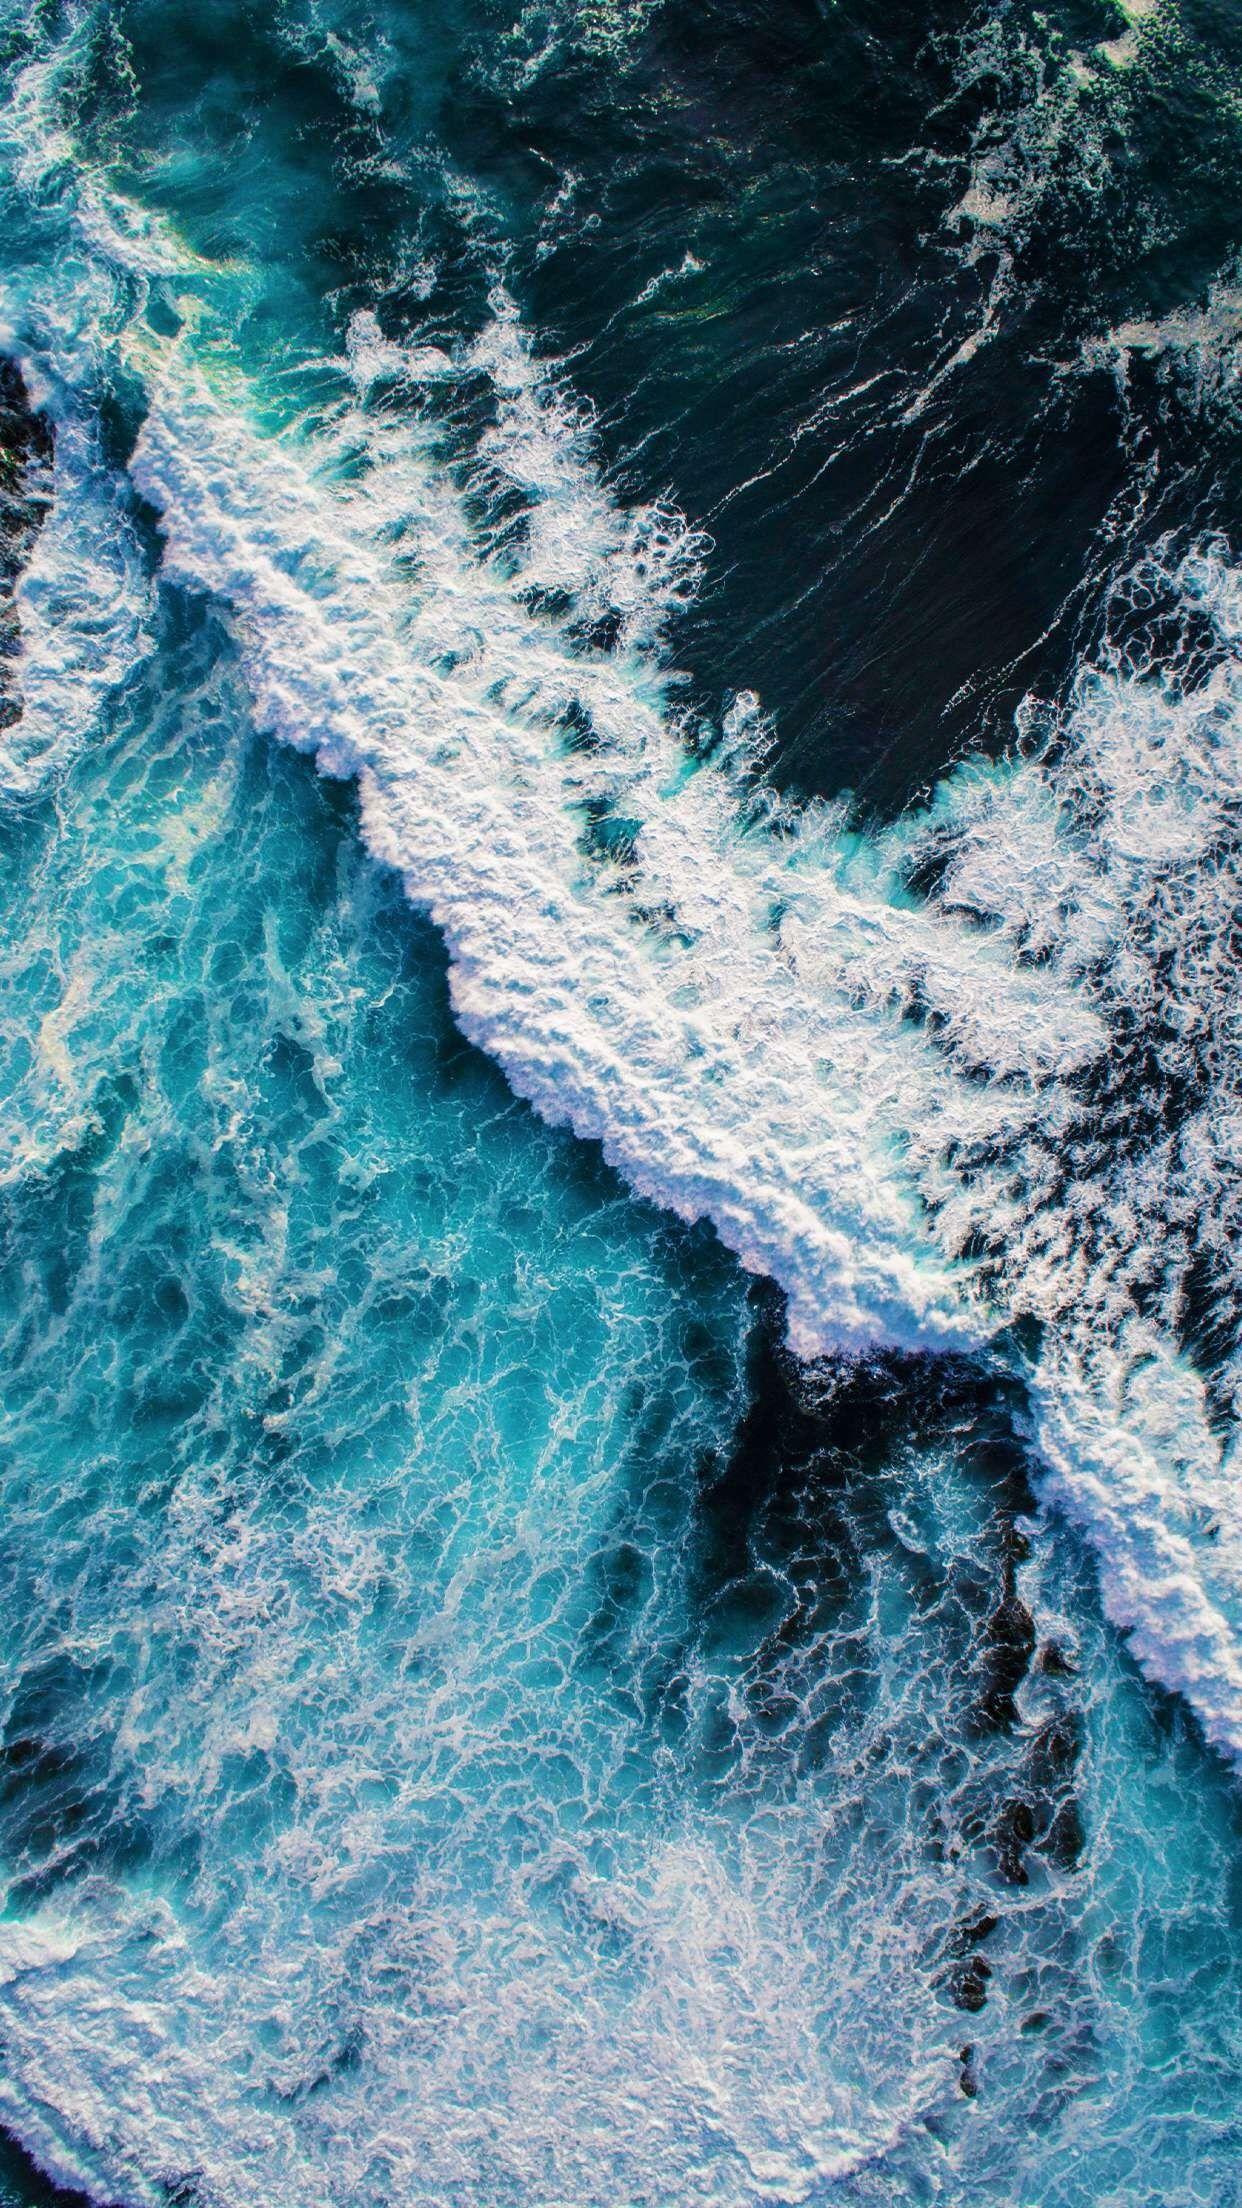 Breathtaking Ocean wallpaper, Iphone background